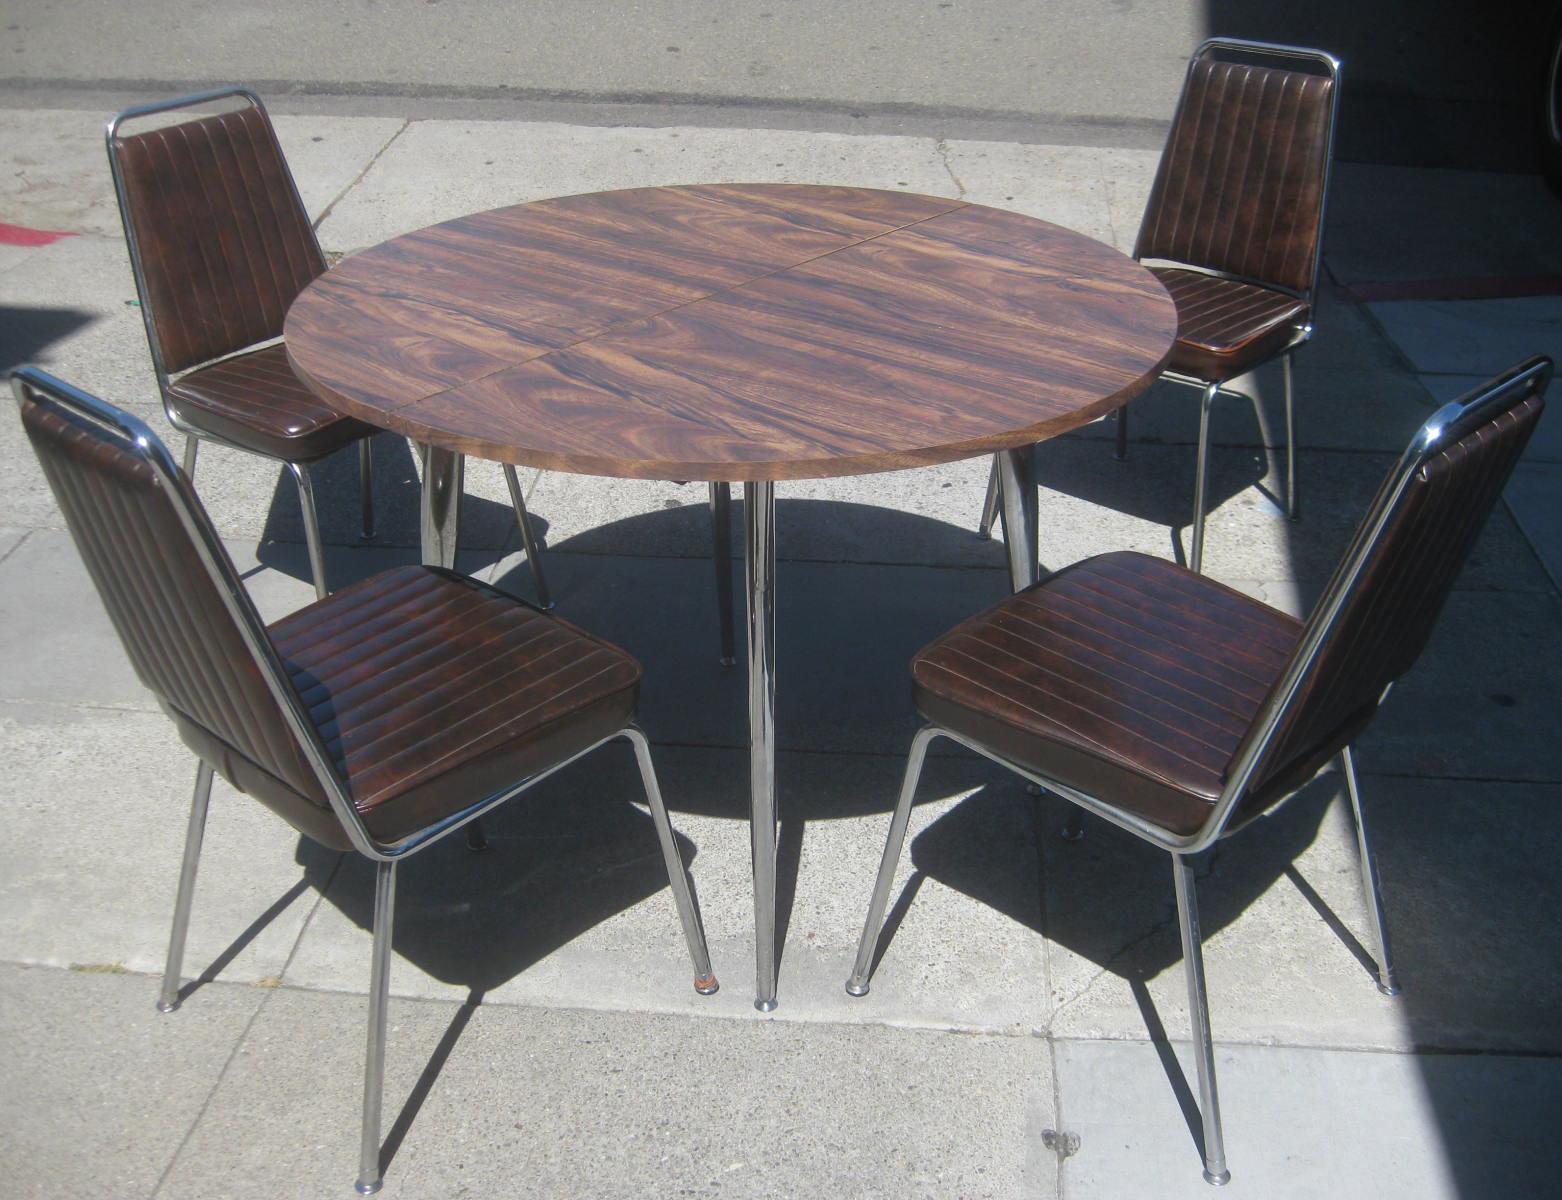 UHURU FURNITURE & COLLECTIBLES: SOLD - Retro Kitchen Table ...